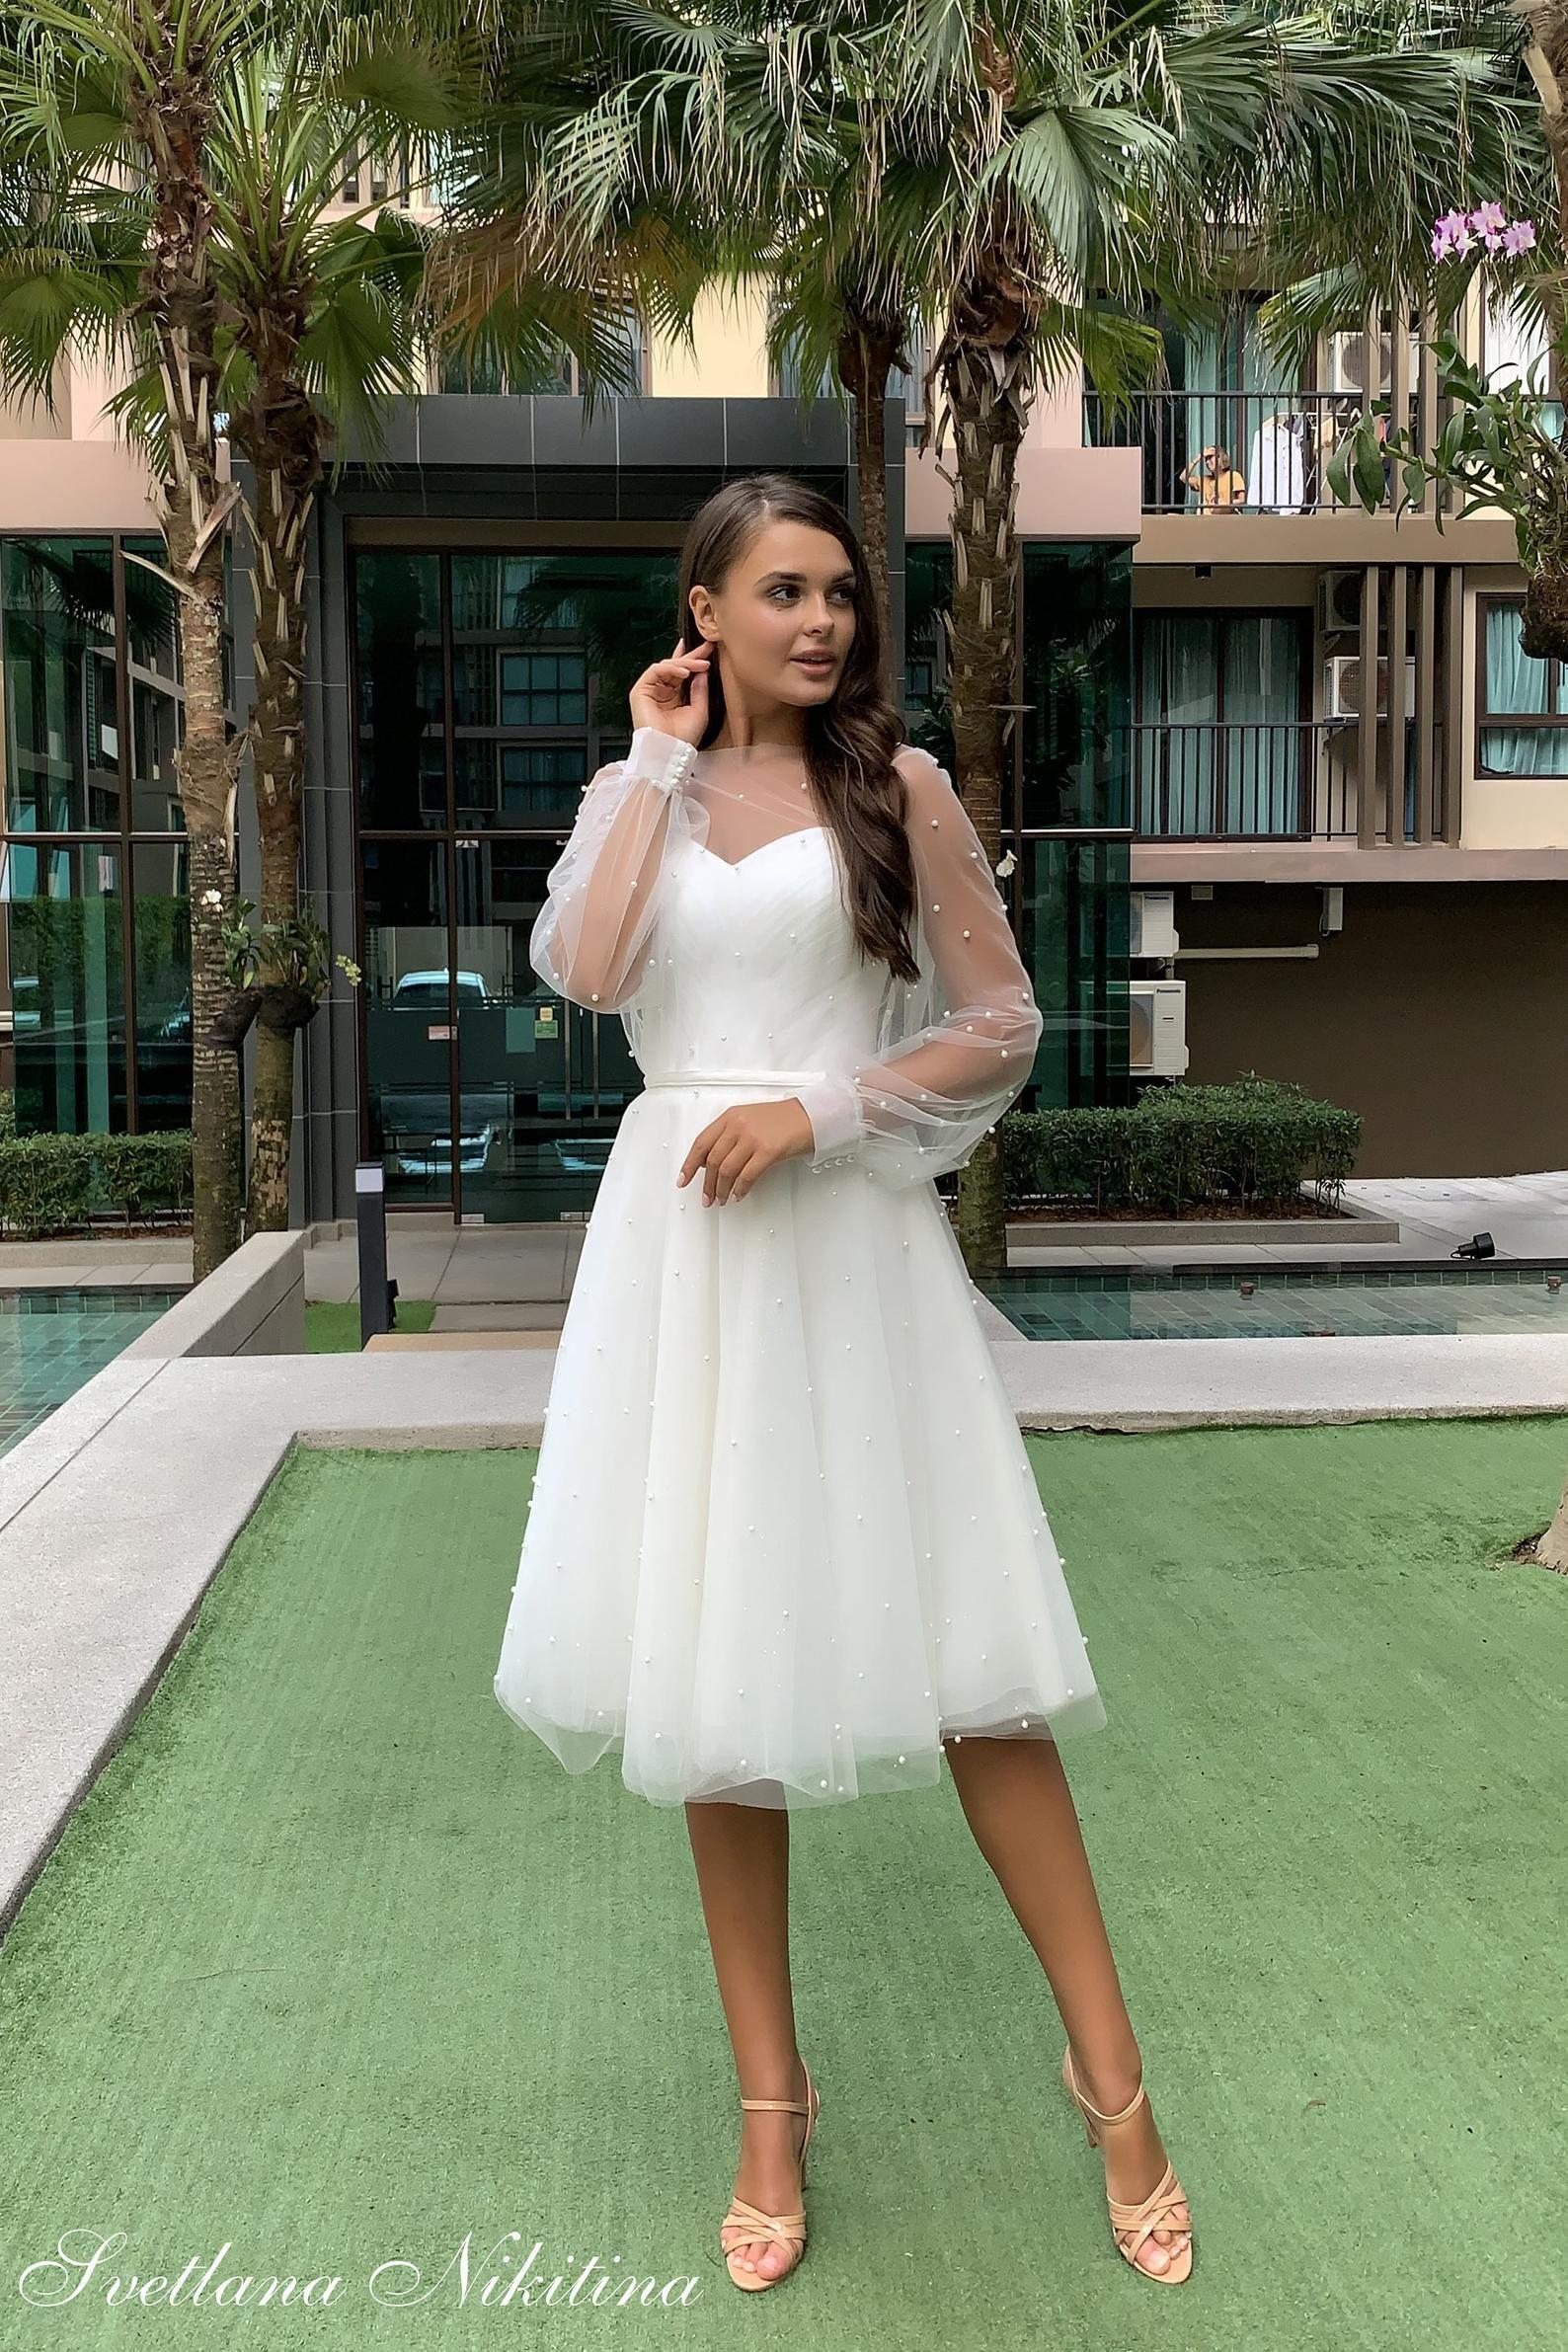 Transformer 2in1 Wedding Dress Short Wedding Gown Shiny Etsy In 2021 Short Wedding Dress Cape Wedding Dress Wedding Dress Sequin [ 2382 x 1588 Pixel ]